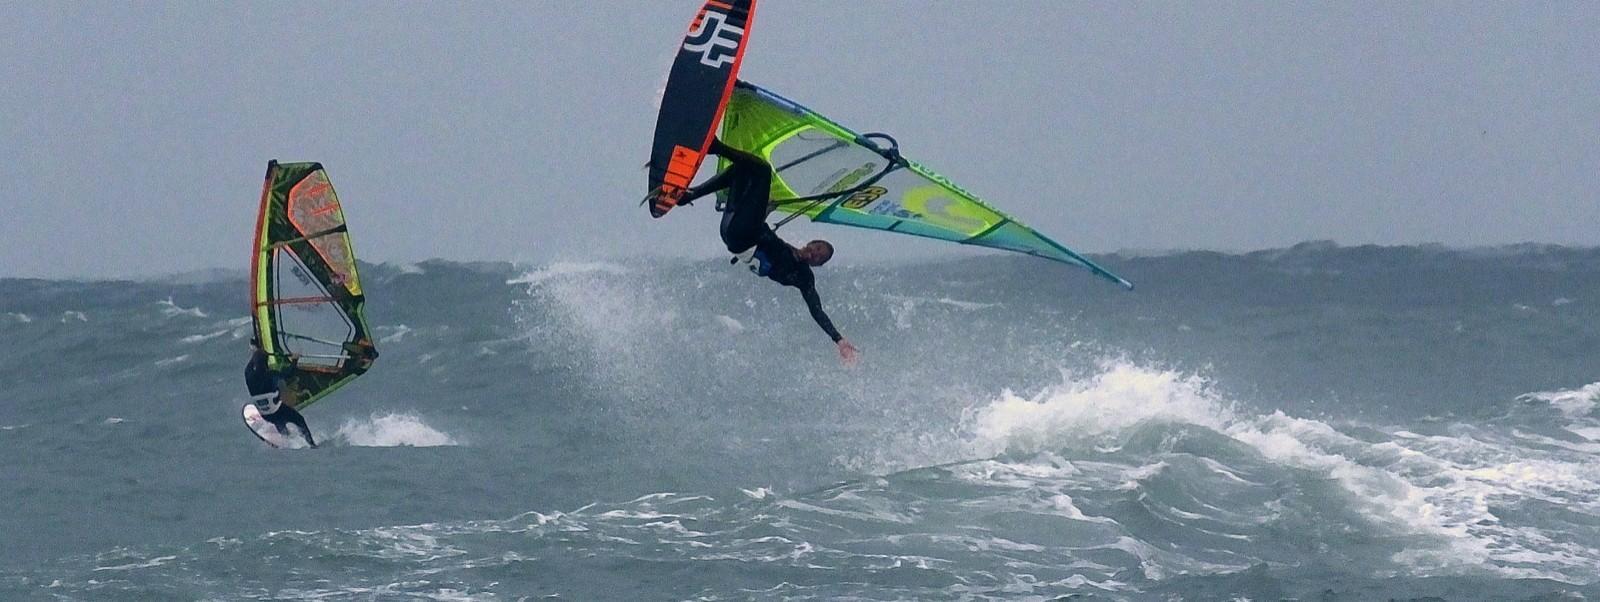 wind report FR, Cap-d'Agde - Plage Richelieu (34)